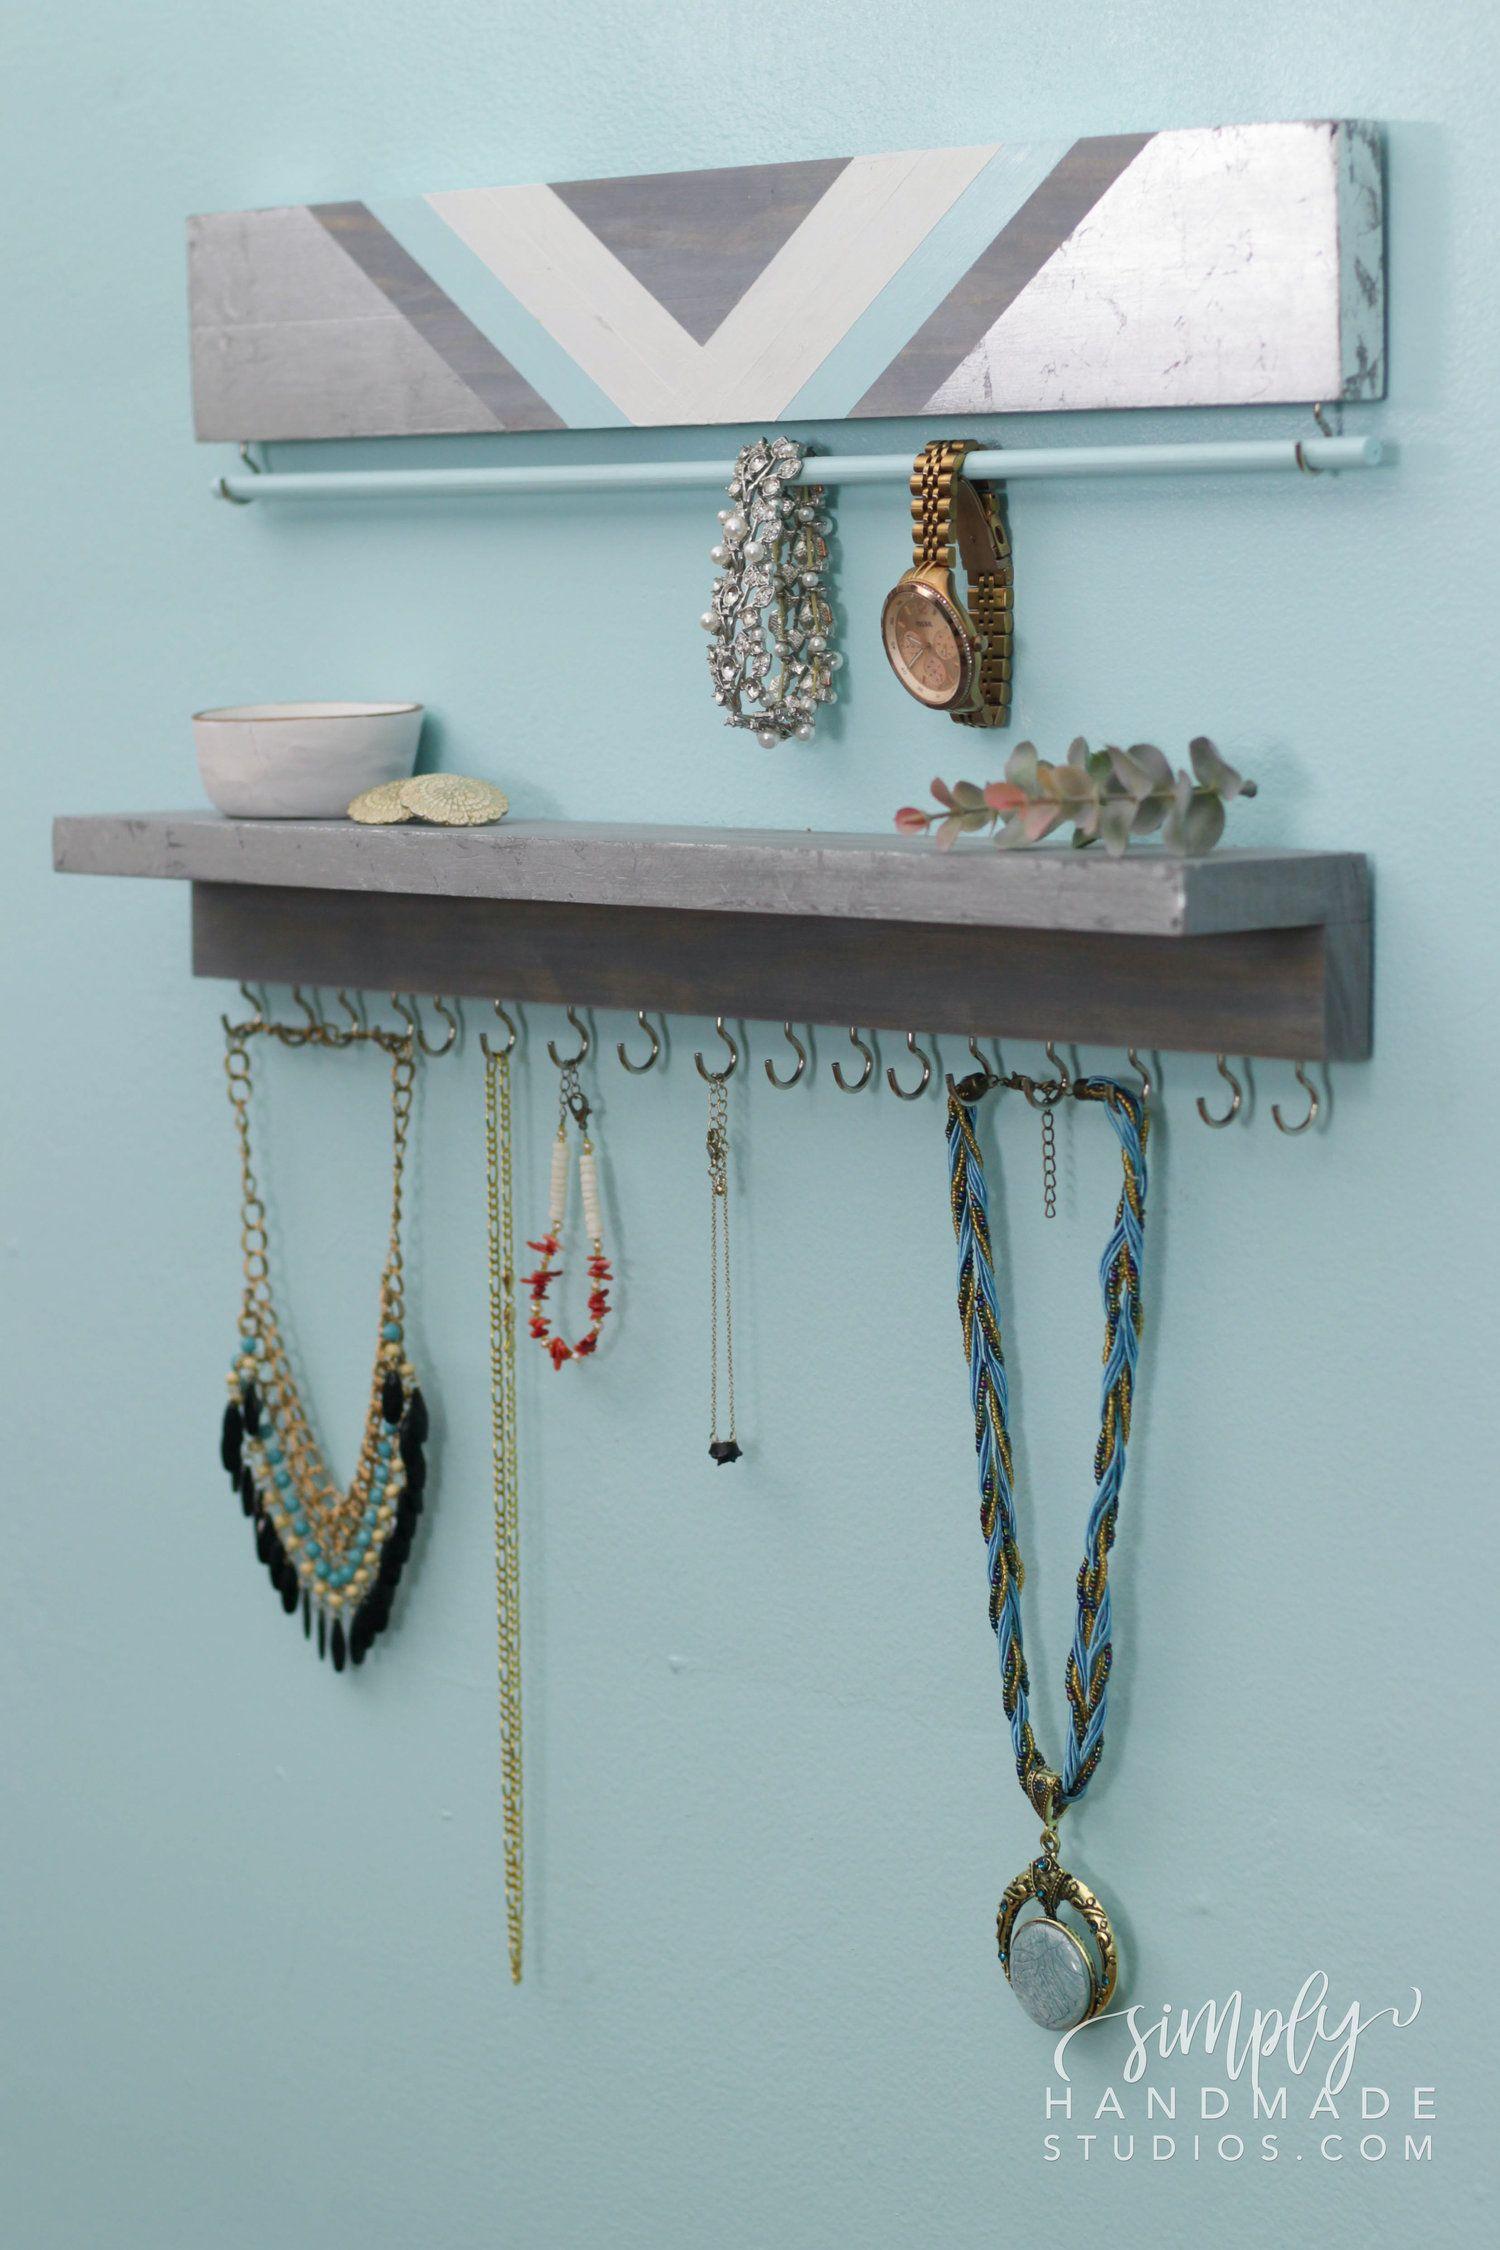 Diy Jewelry Organizer Simply Handmade Studios In 2020 Diy Jewelry Organizer Box Jewelry Organizer Box Diy Jewelry Holder